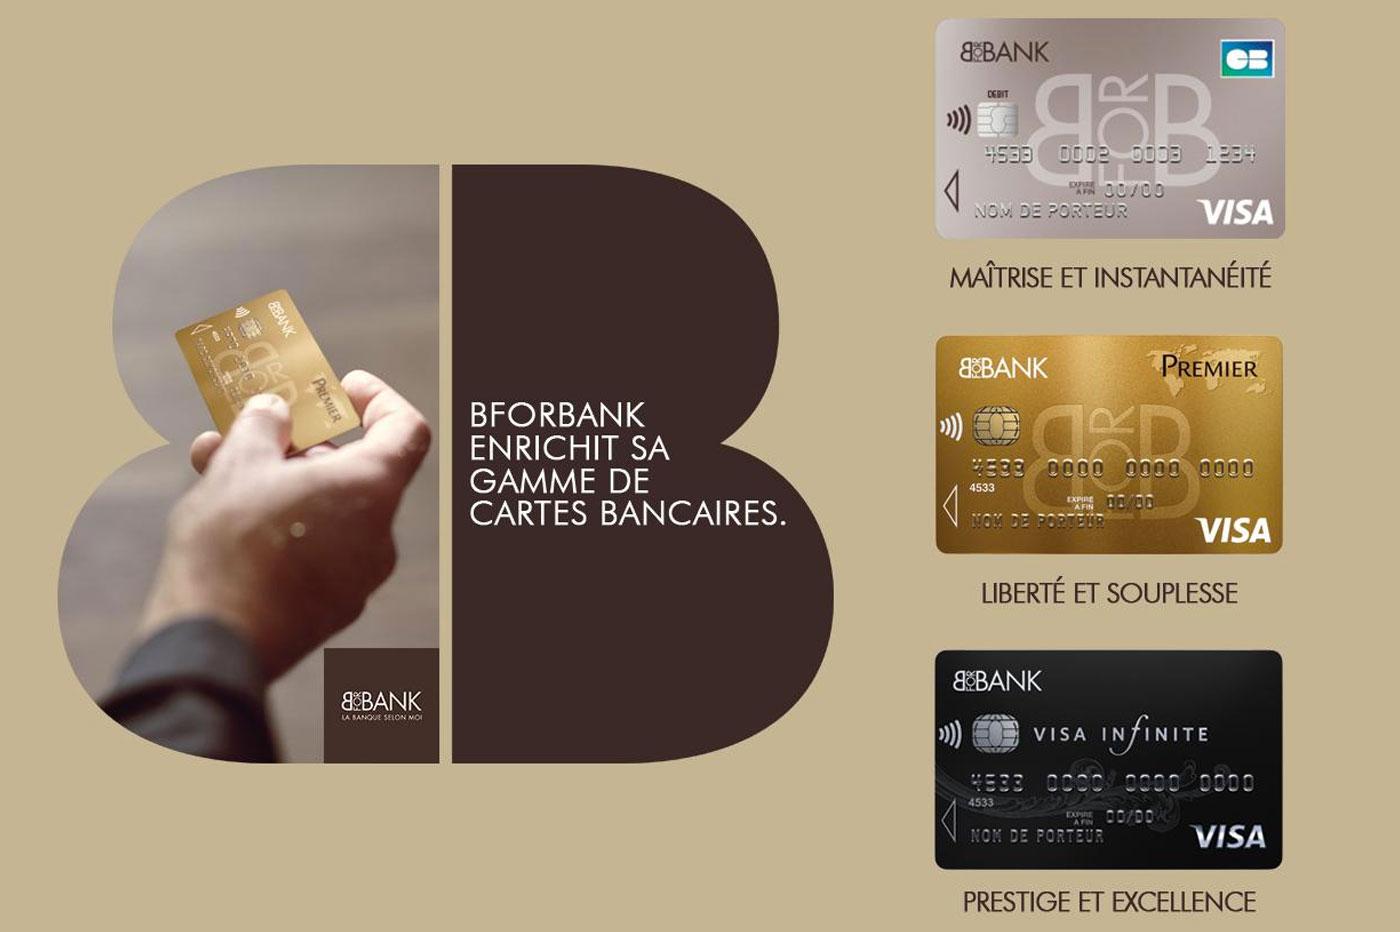 Carte bancaire BforBank